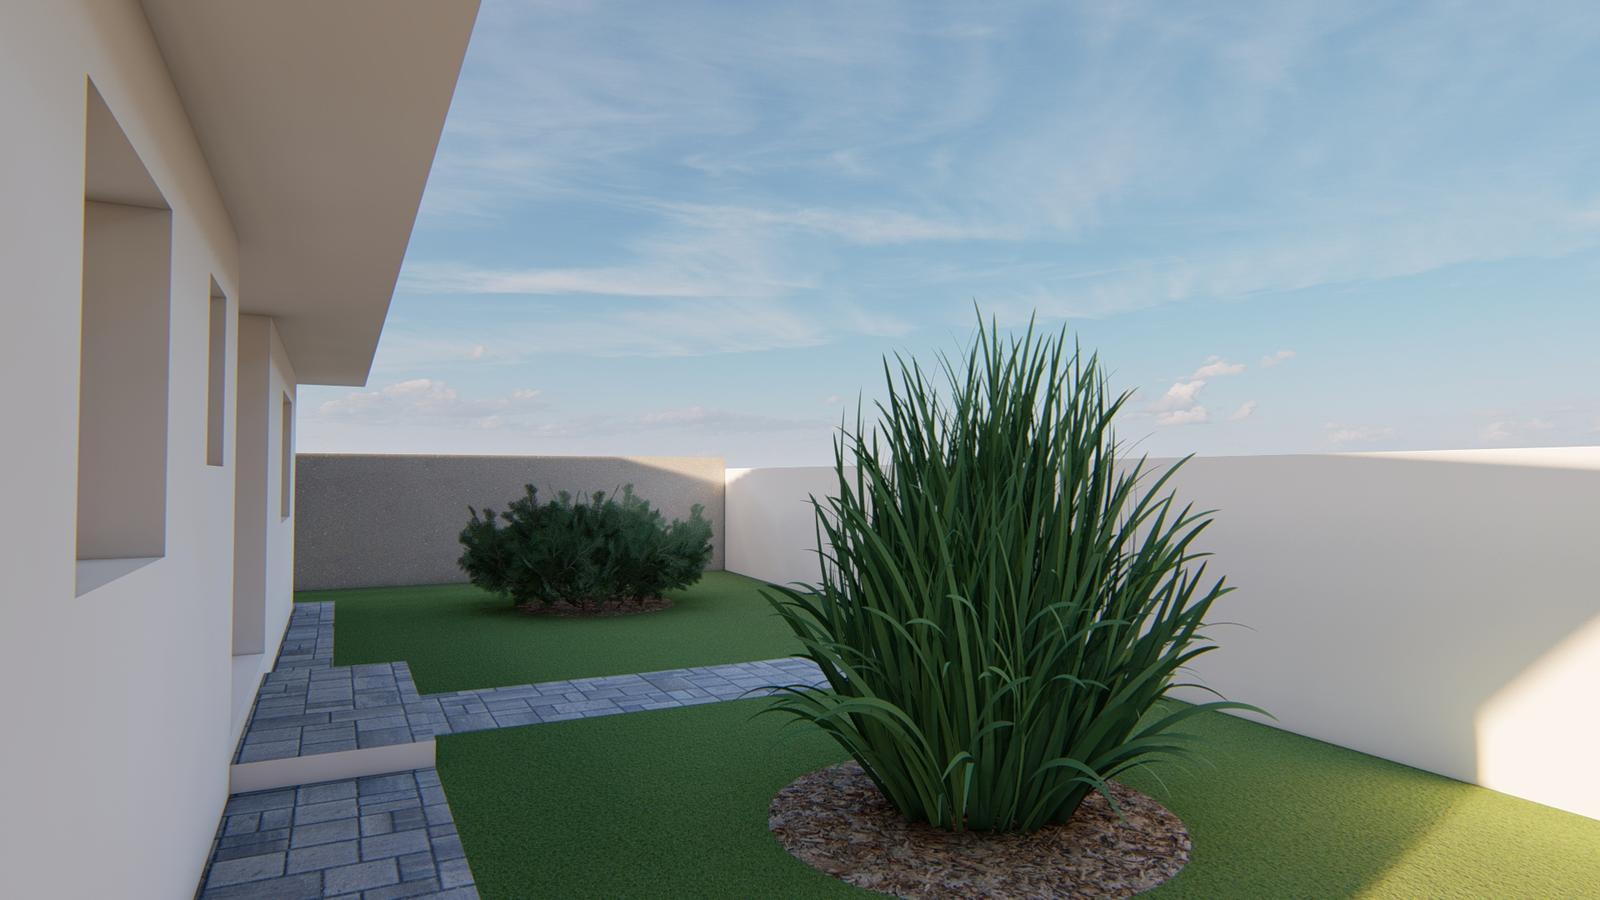 Návrh záhrady rodinného domu - Obrázok č. 32